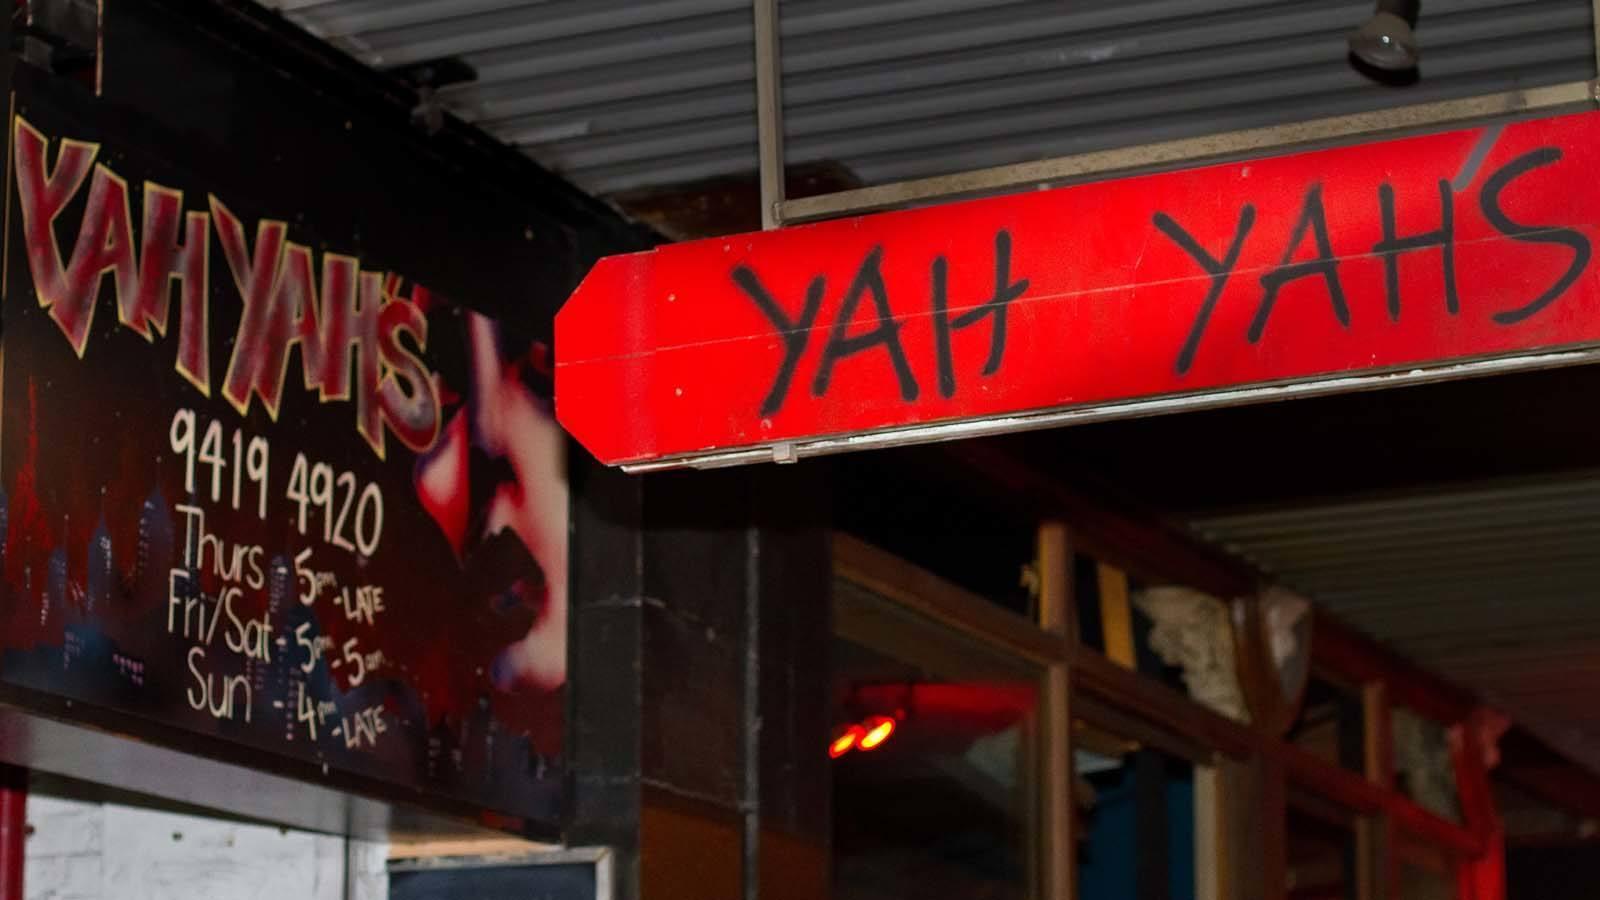 Yah Yahs, Fitzroy, Melbourne, Victoria, Australia